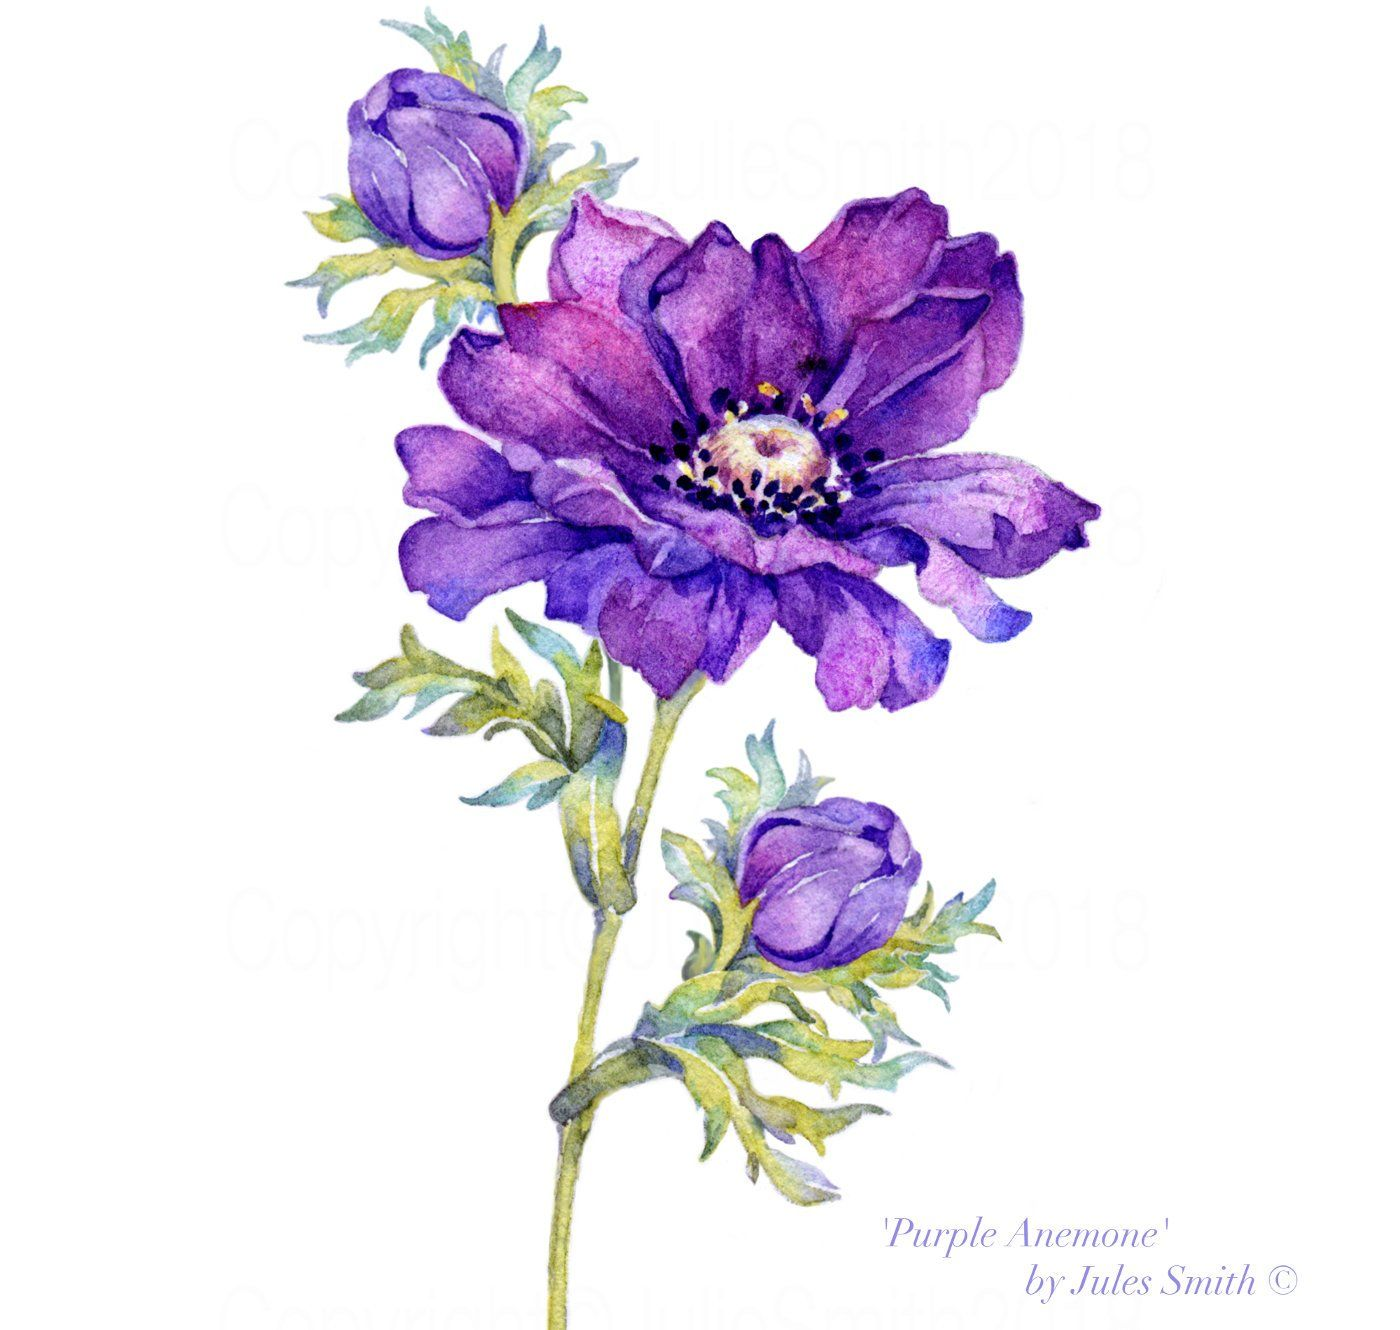 Watercolour Purple Anemone Limited Edition Reproduction Etsy Flower Prints Art Watercolor Flowers Paintings Watercolor Flower Art